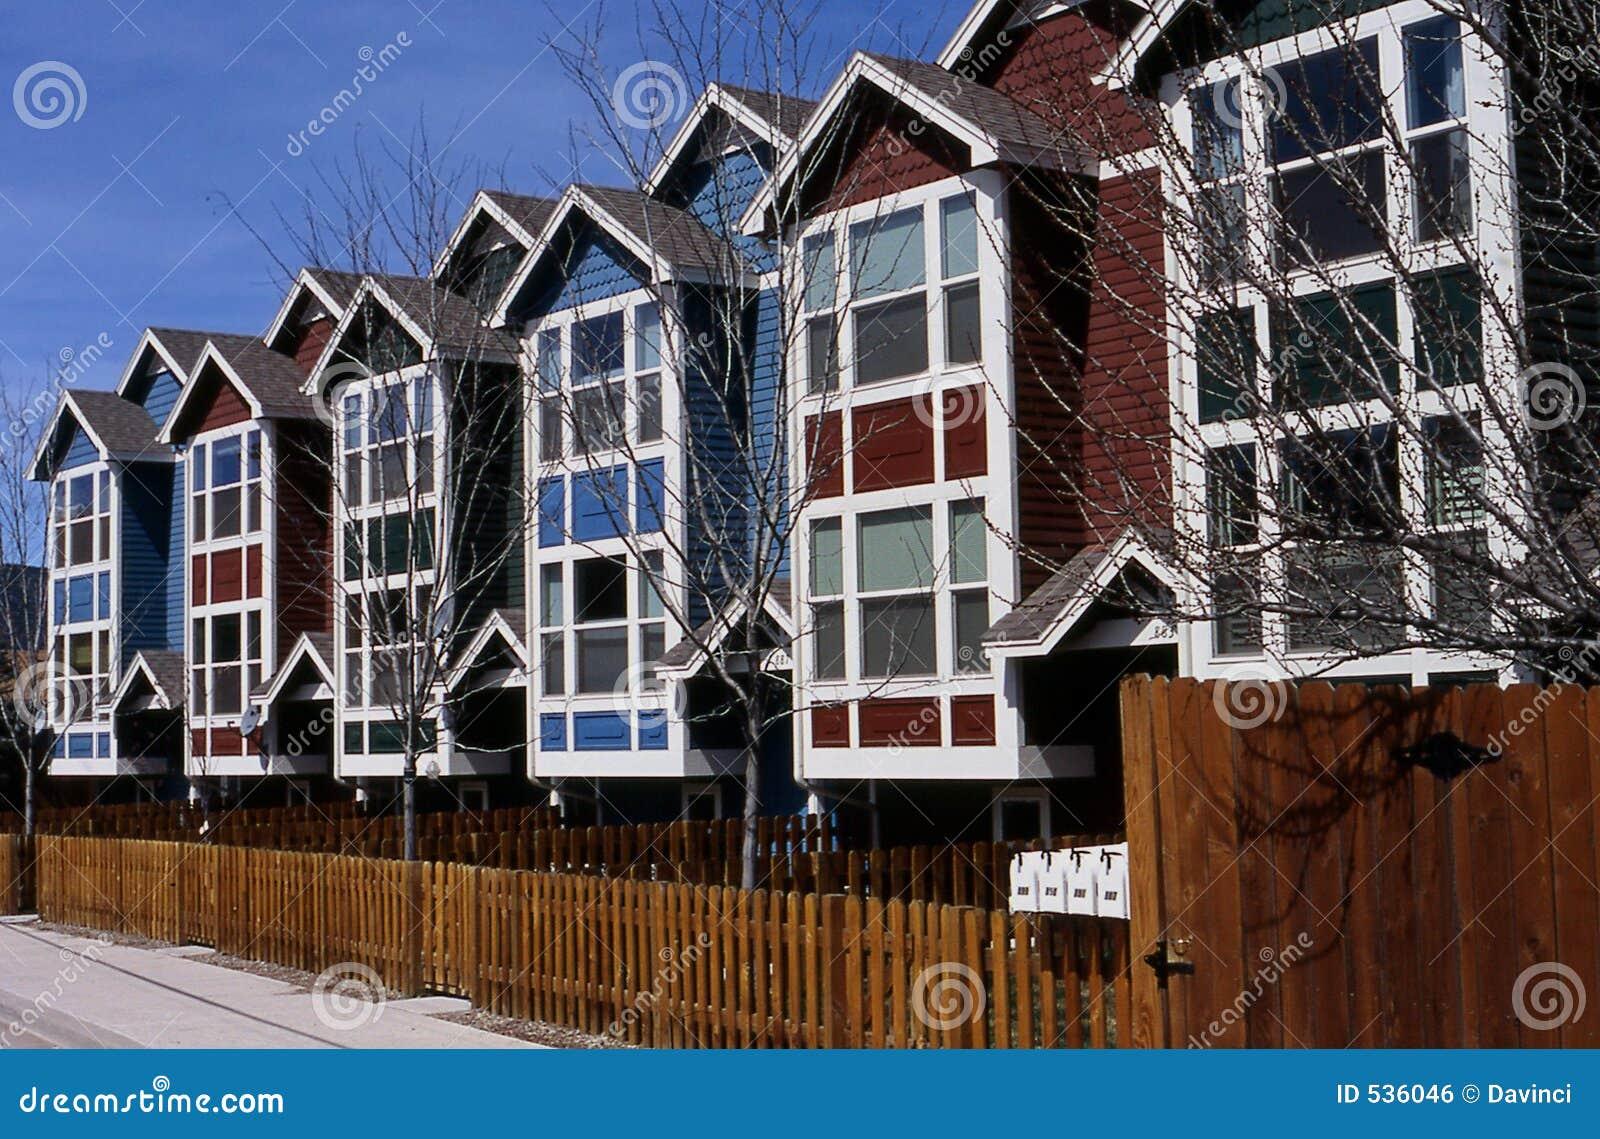 Download 家行 库存照片. 图片 包括有 红色, 租务, 住房, 屋顶, 模式, 视窗, 蓝色, 连栋房屋 - 536046